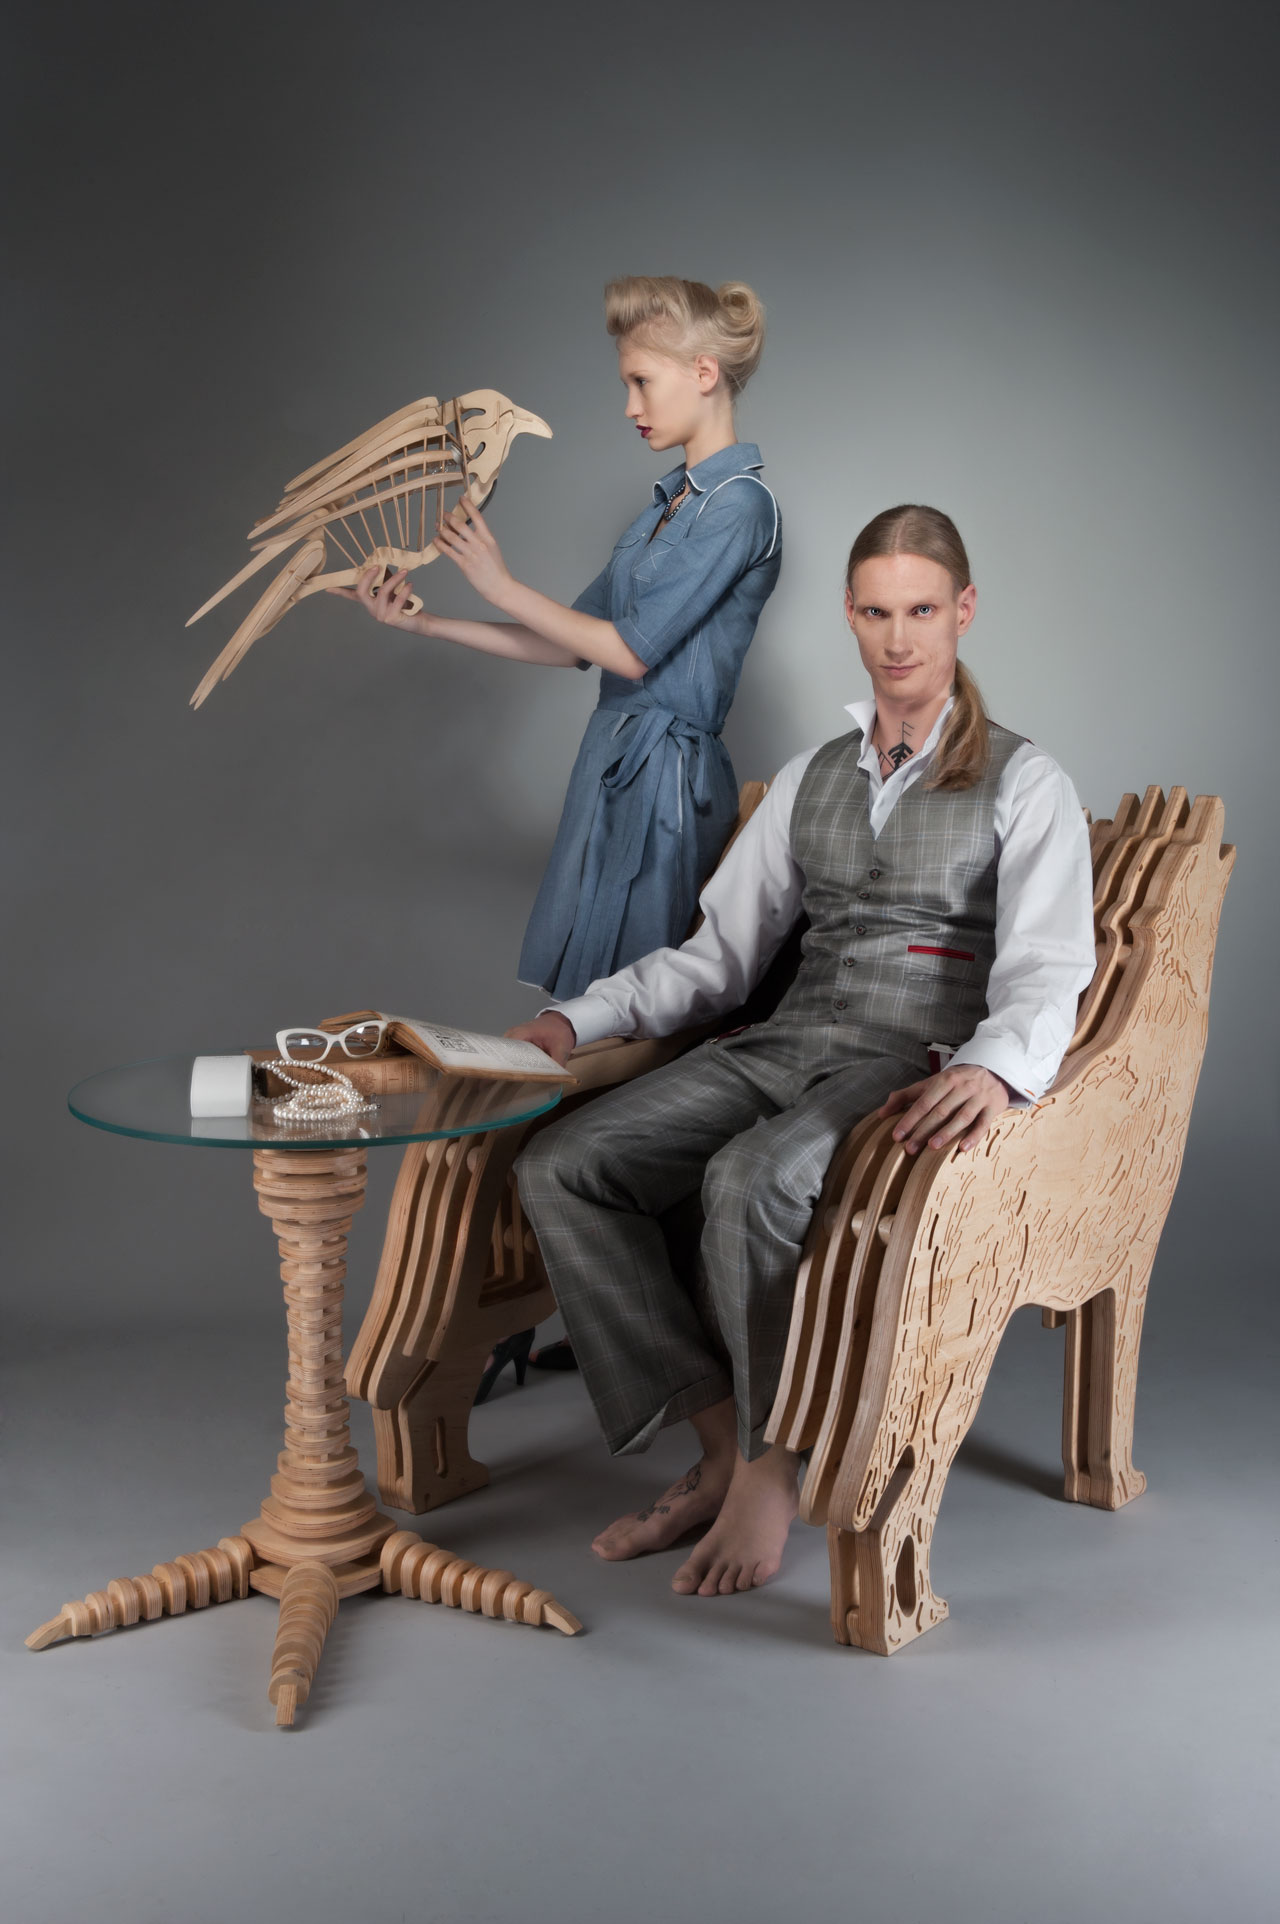 A series of furniture inspired by fables by SVAROG. Photo byAneta Kowalczyk & Kacper Lipinski/Kiali.